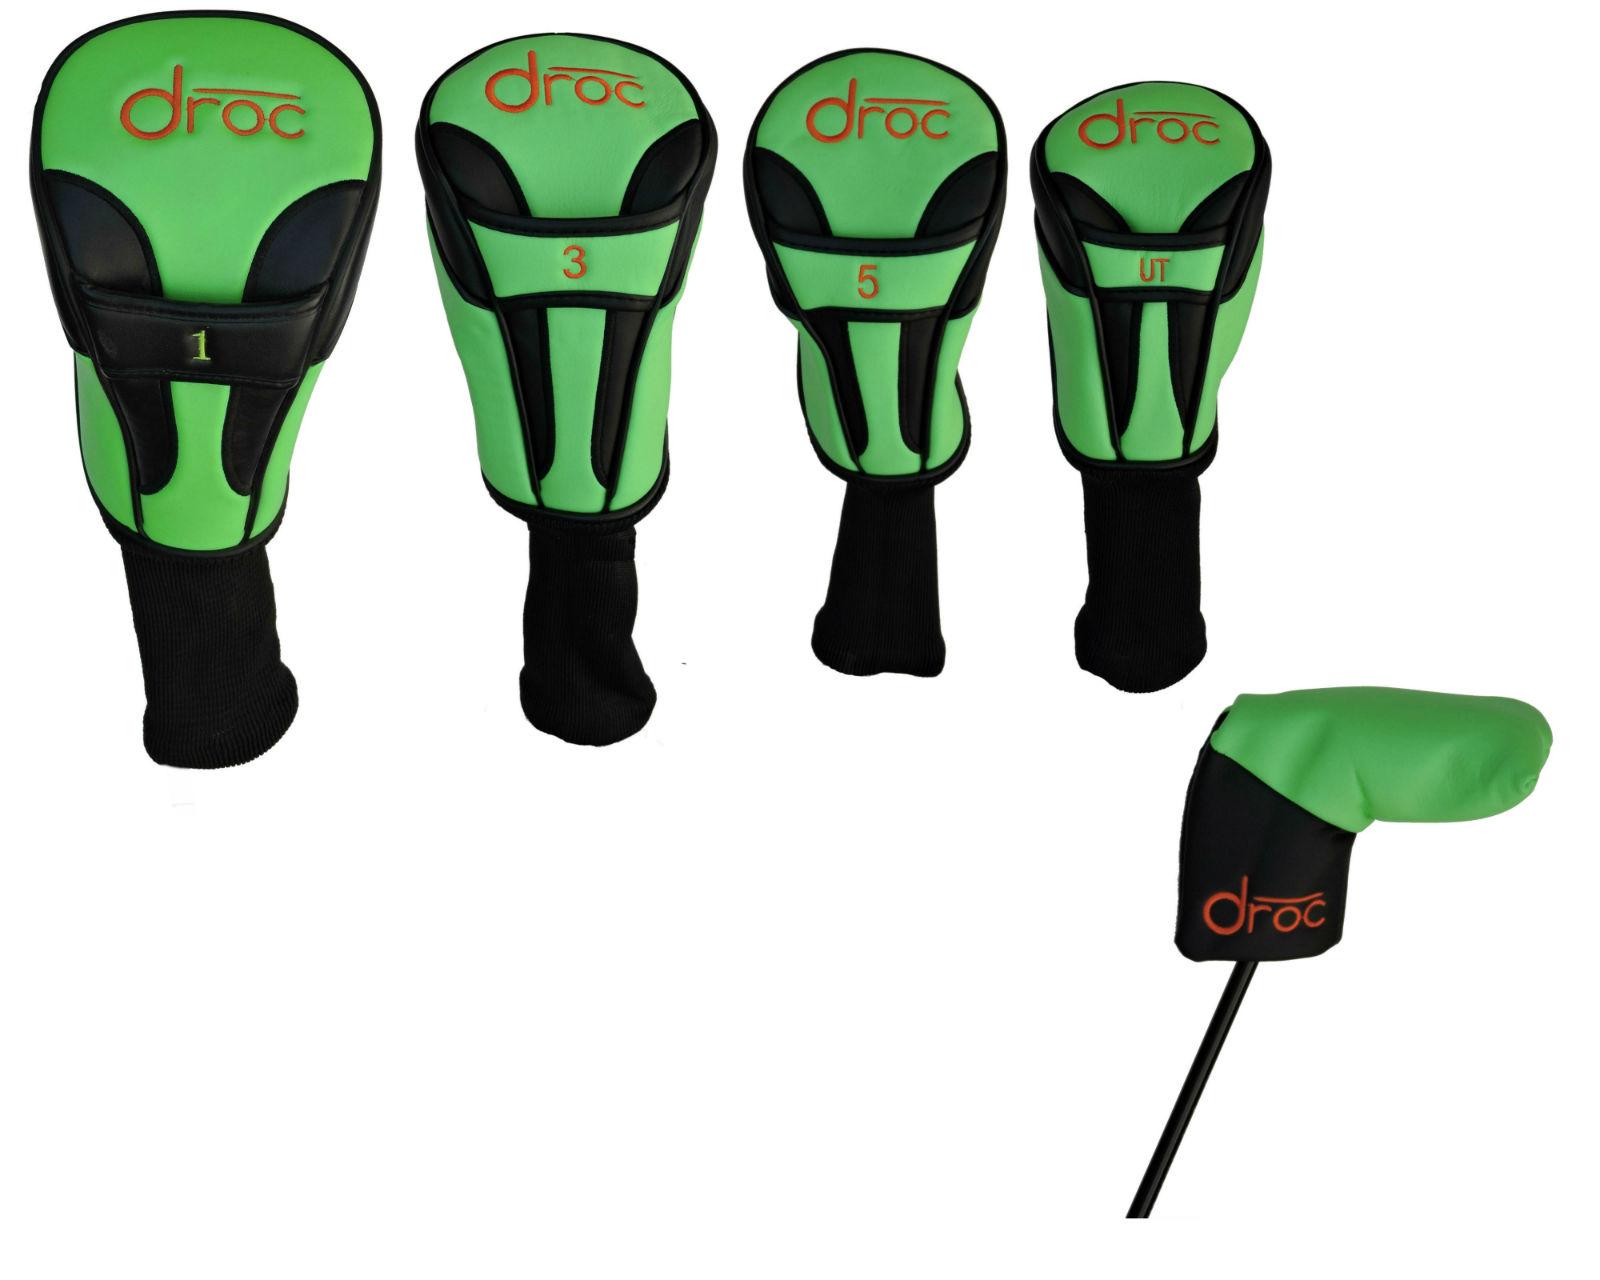 Golf Club Socks